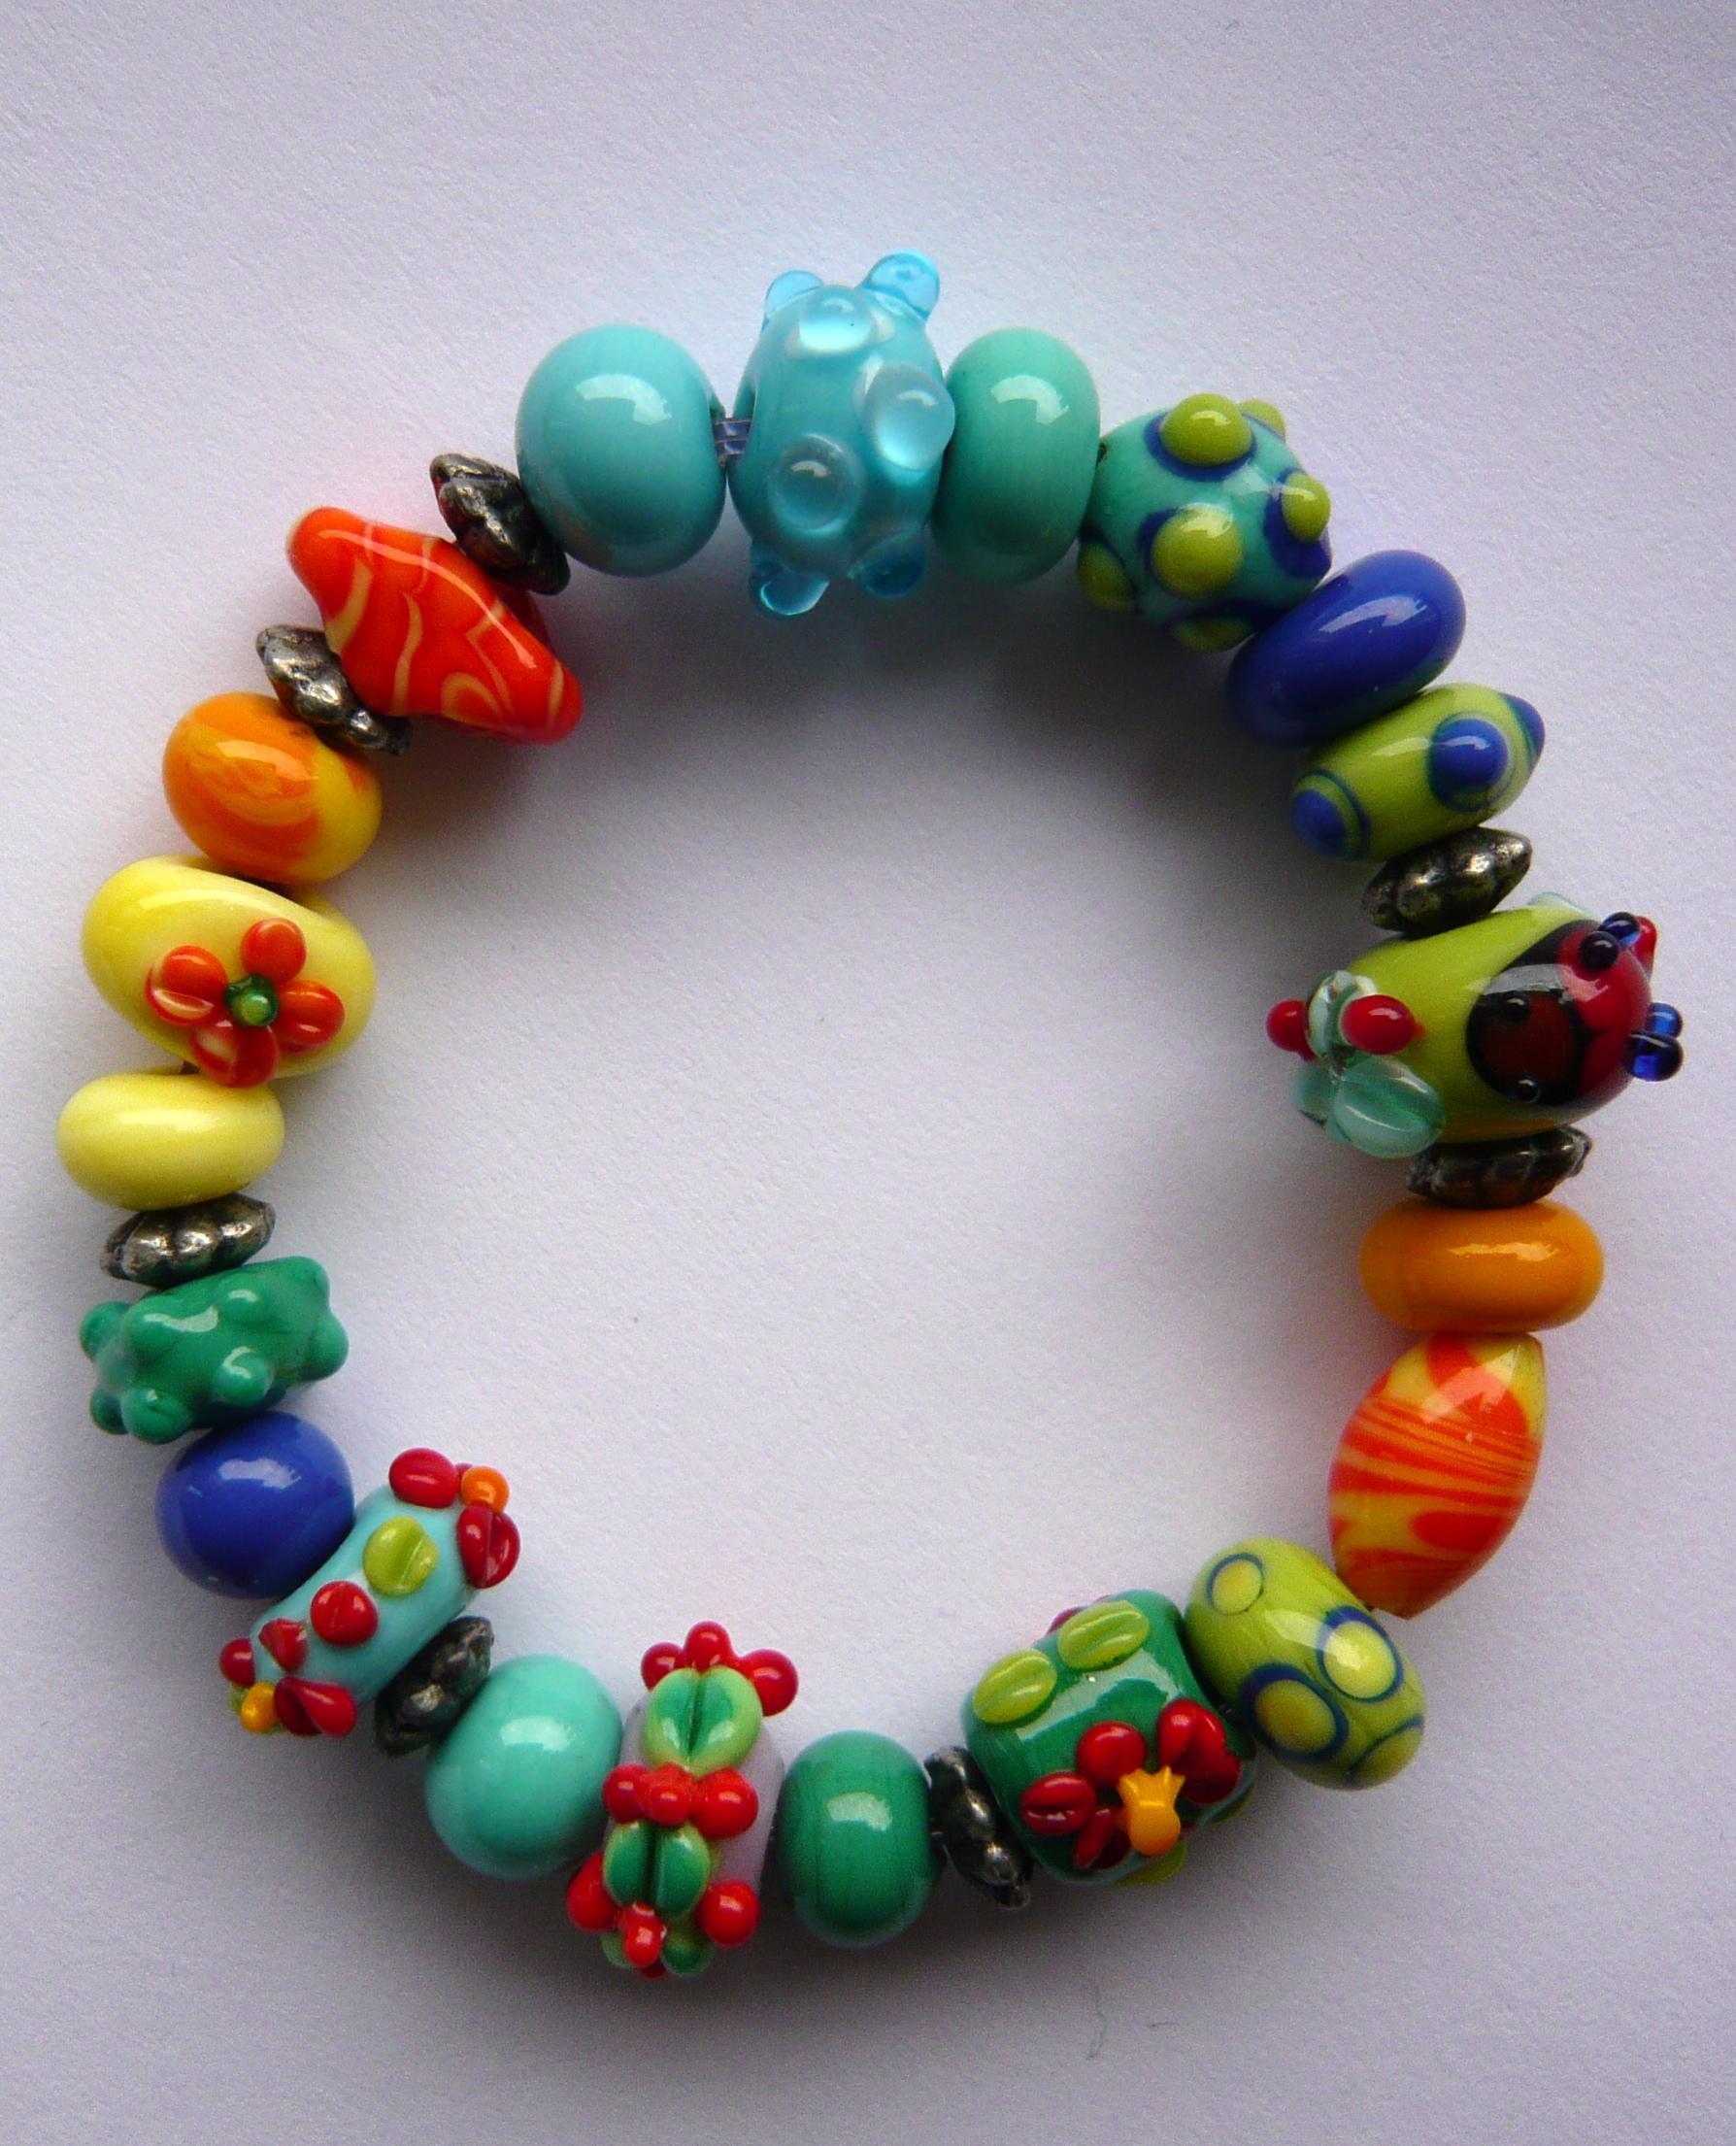 Kleurijke sieraden Kindarmband1